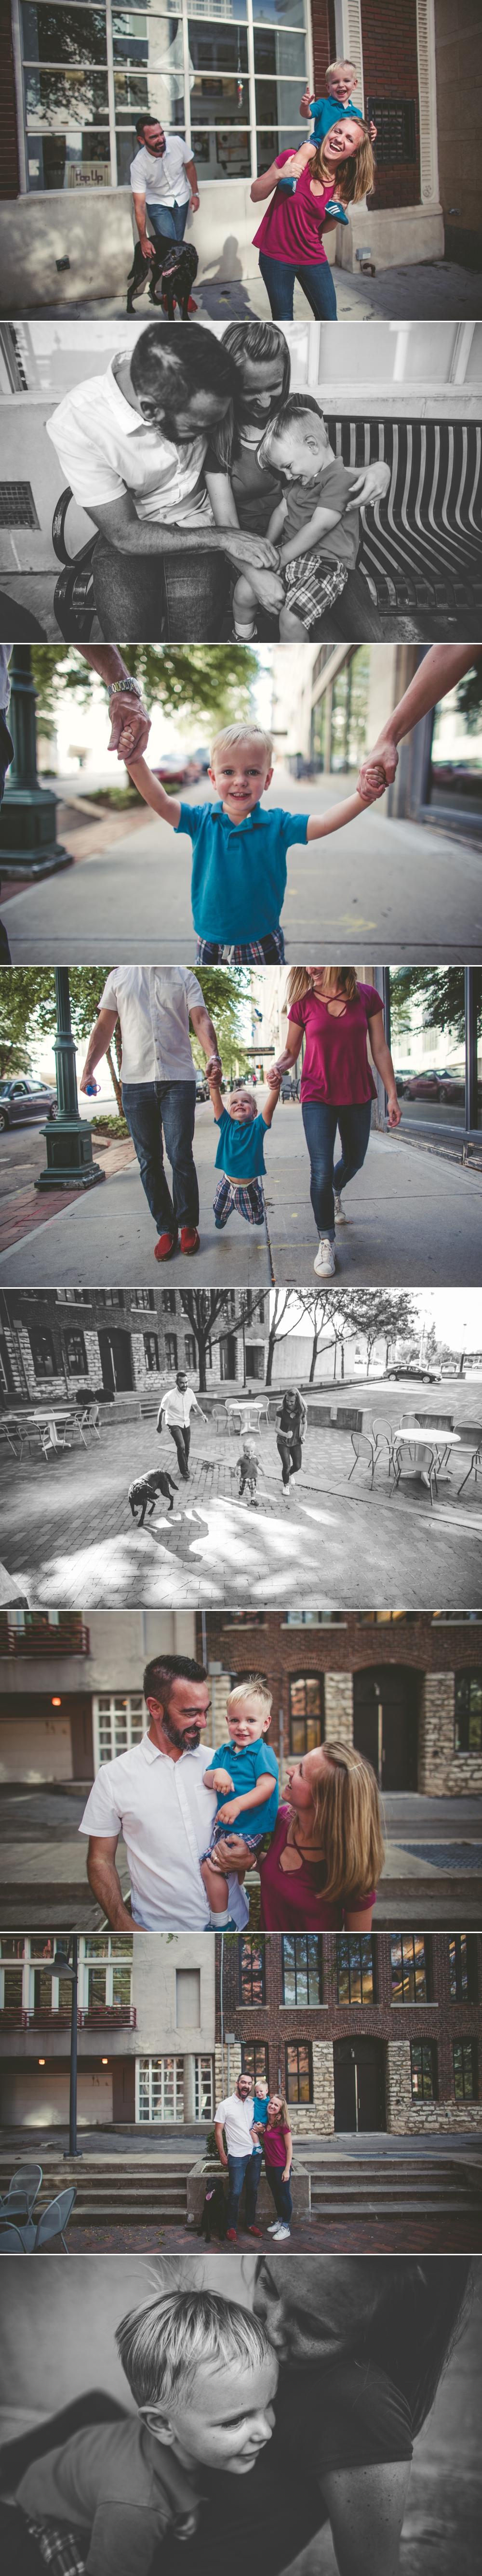 jason_domingues_photography_best_kansas_city_photographer_family_lifestyle_portraits_kc_00011.jpg